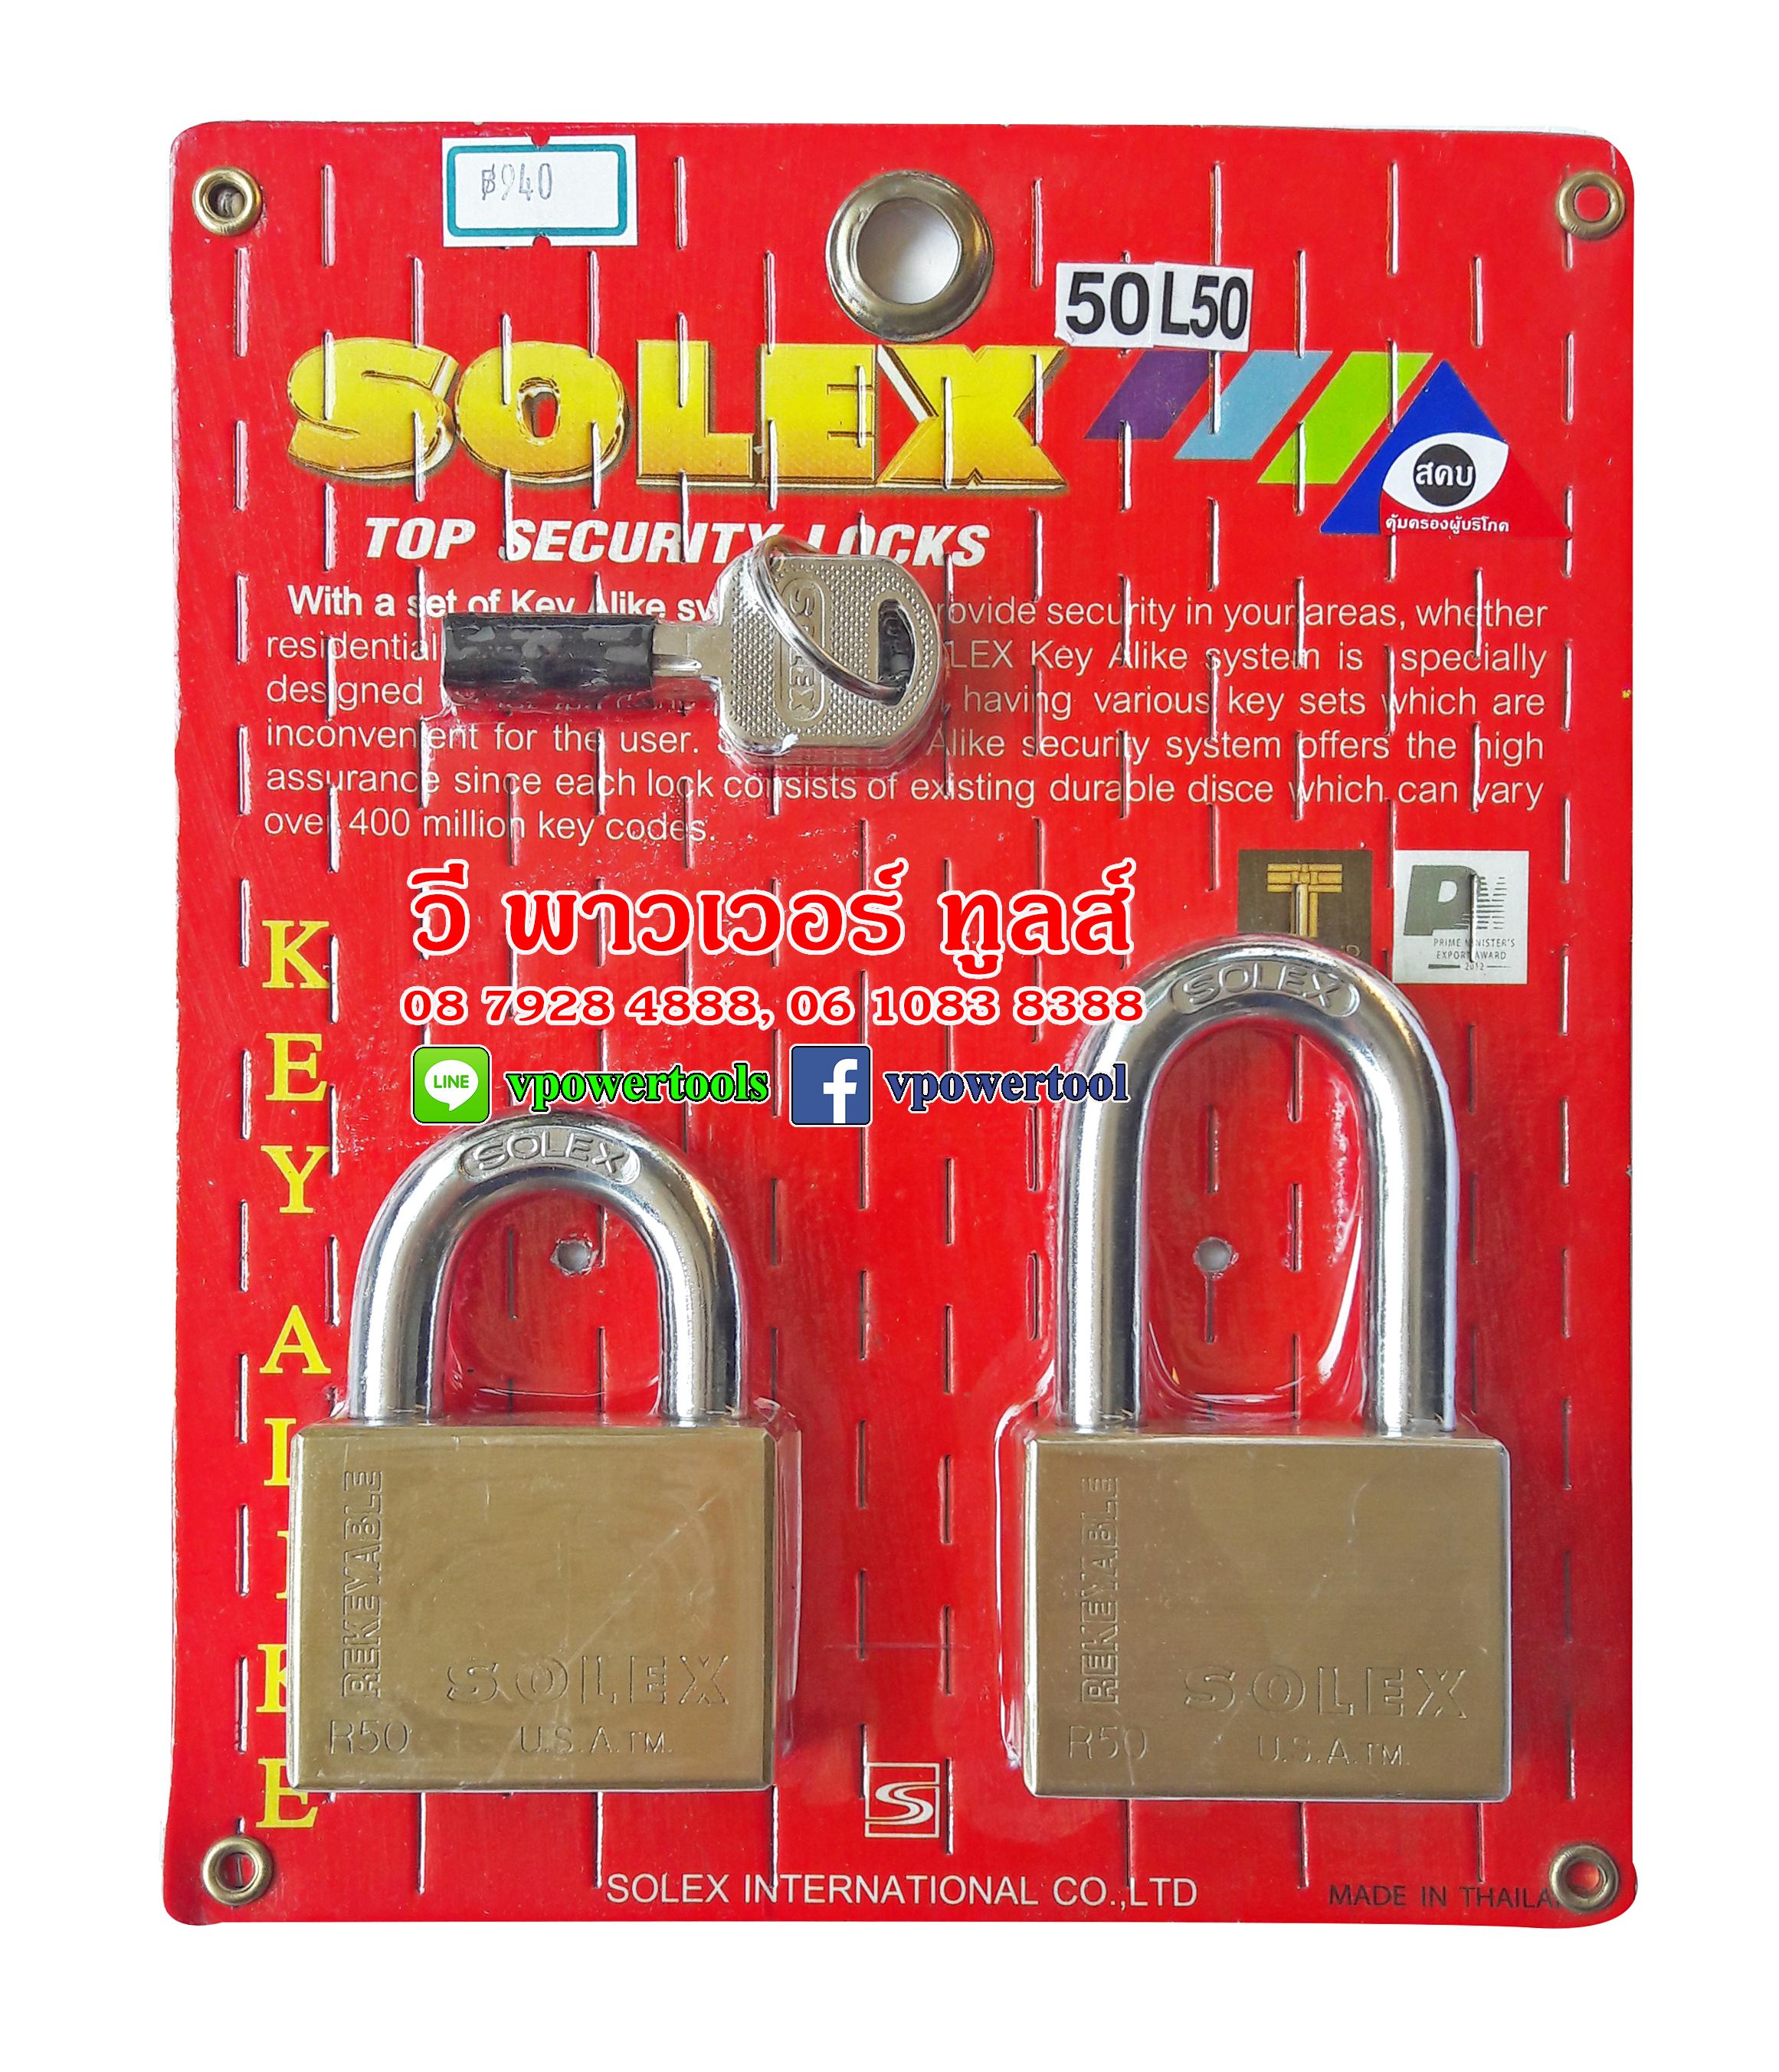 SOLEX KEY ALIKED กุญแจทองเหลืองแท้ ขนาด 50 มม.ห่วงสั้นและยาว